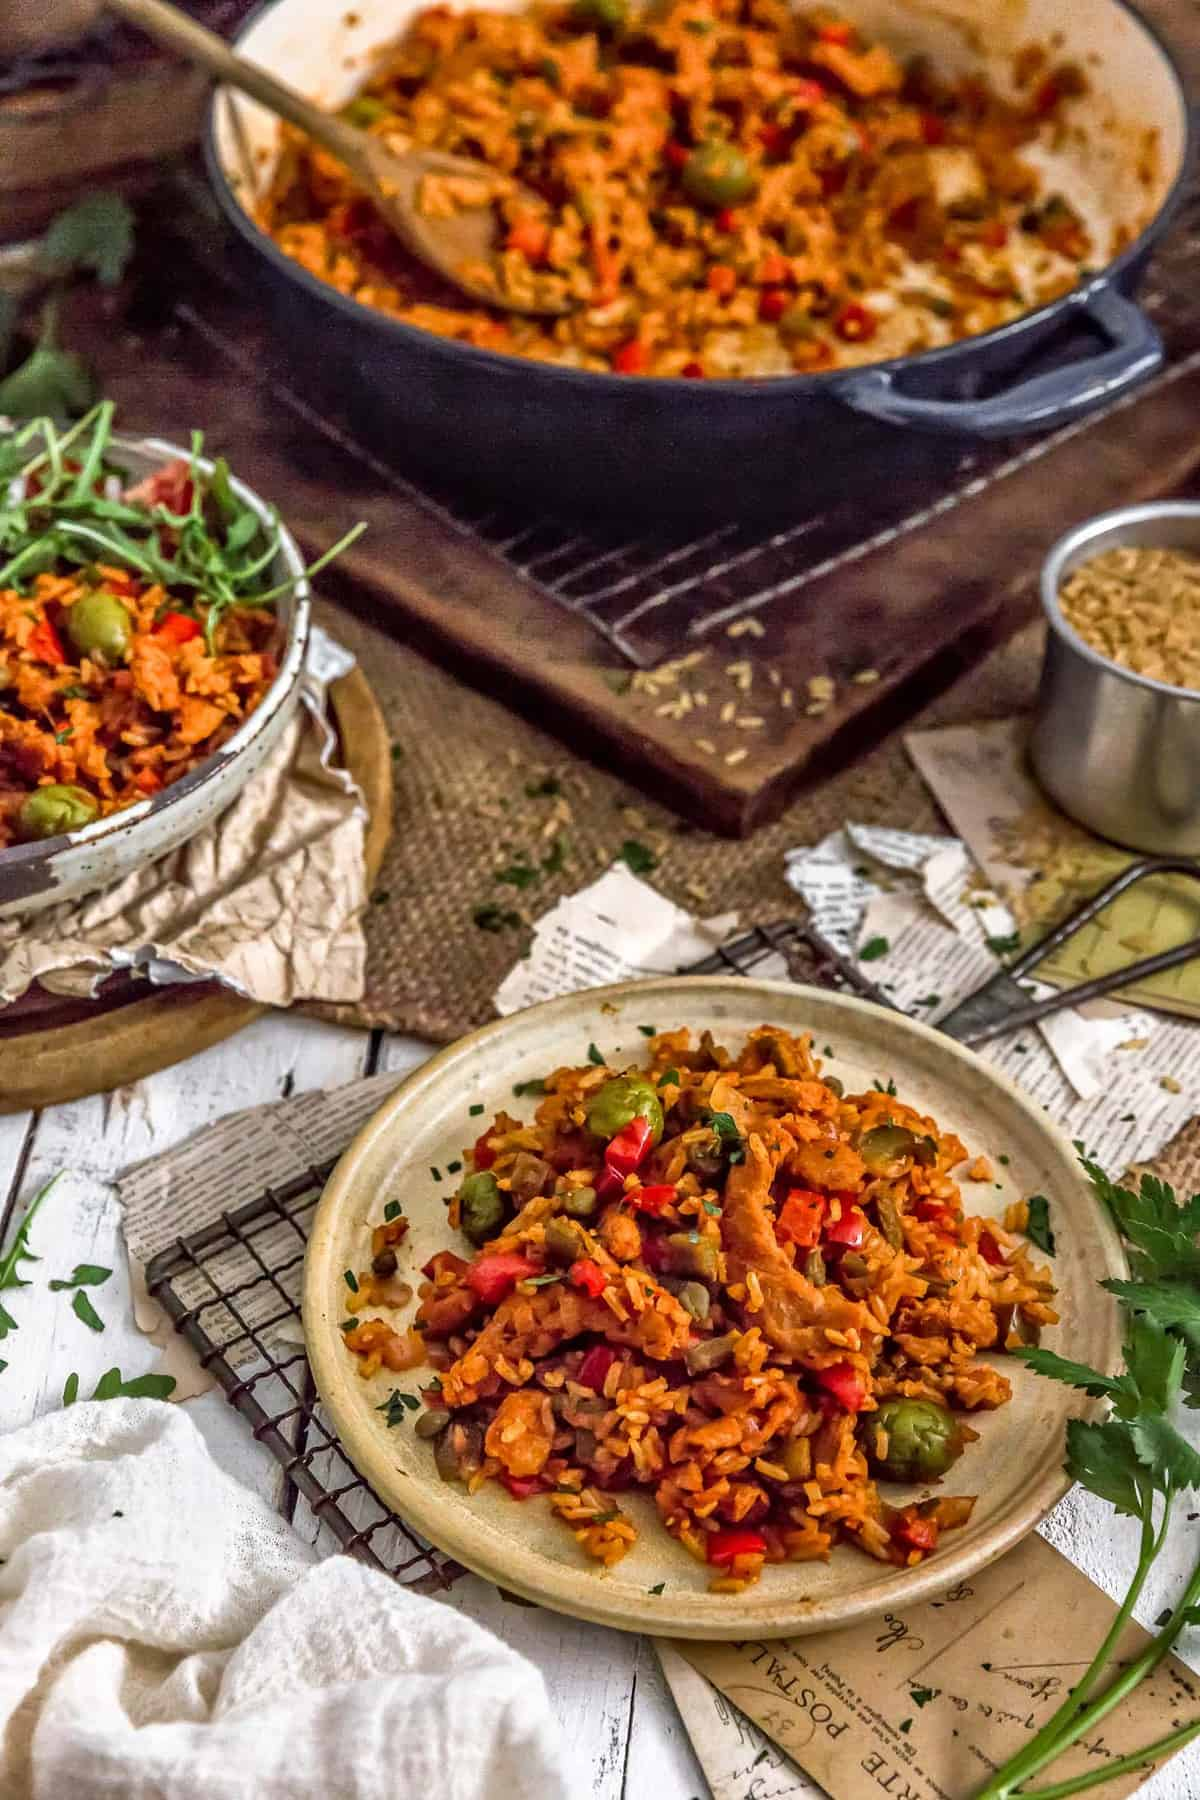 Tablescape with Vegan Arroz on Pollo